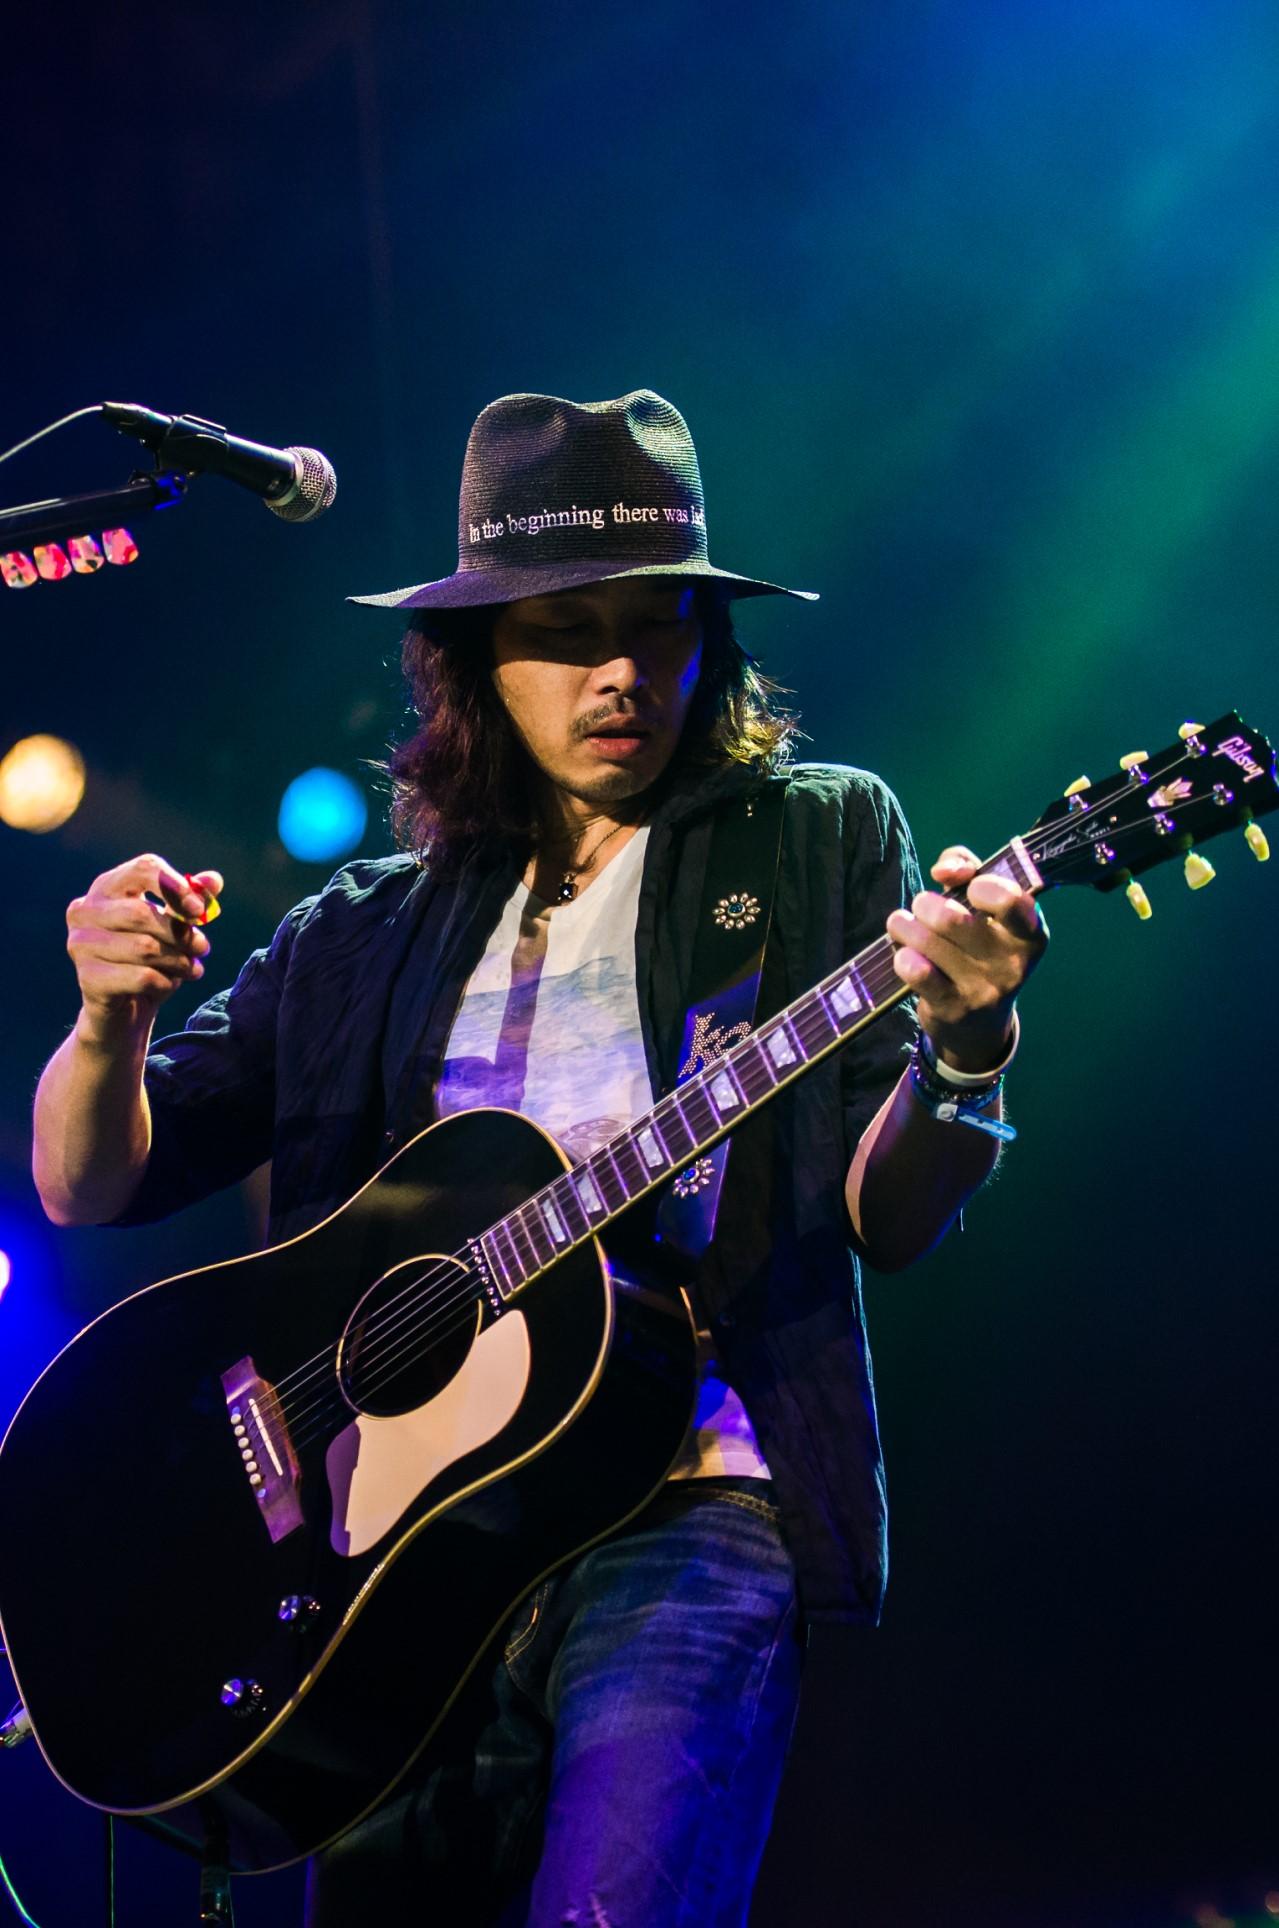 Gibson Accoustic Kazuyoshi Saito J-45|ギブソンアコースティックギター 斉藤和義モデル